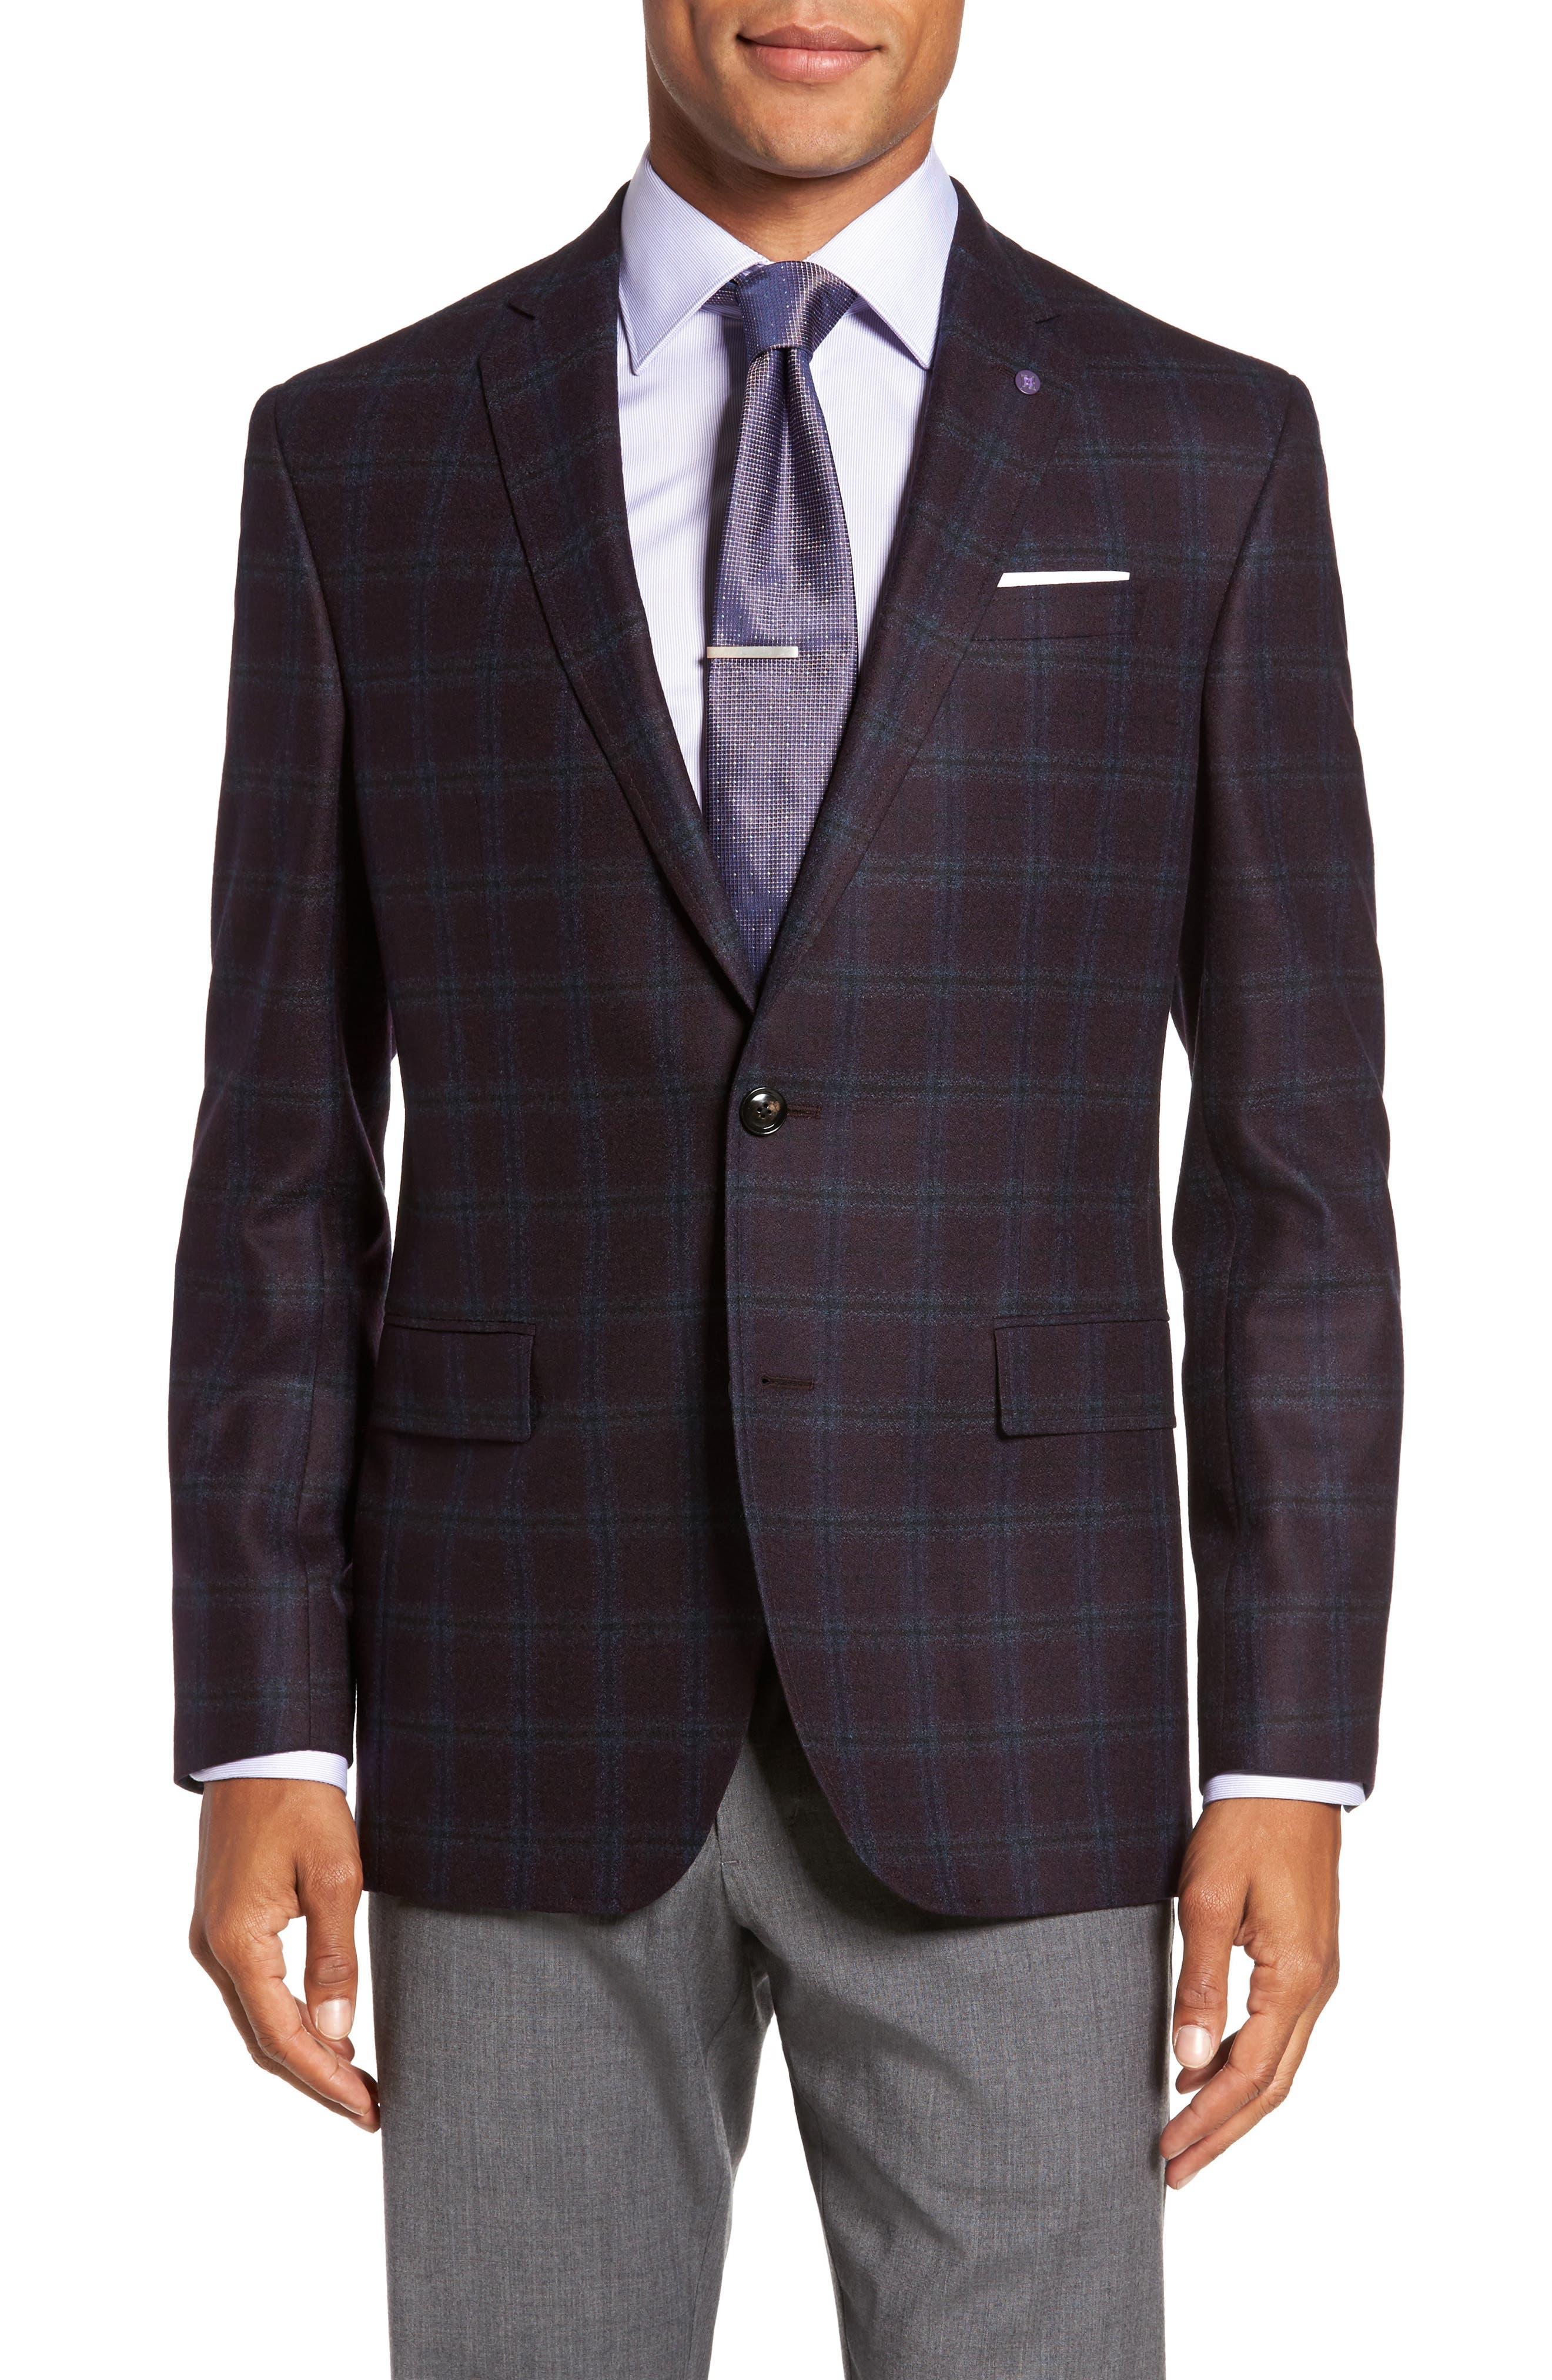 Alternate Image 1 Selected - Ted Baker London Trim Fit Plaid Wool Sport Coat